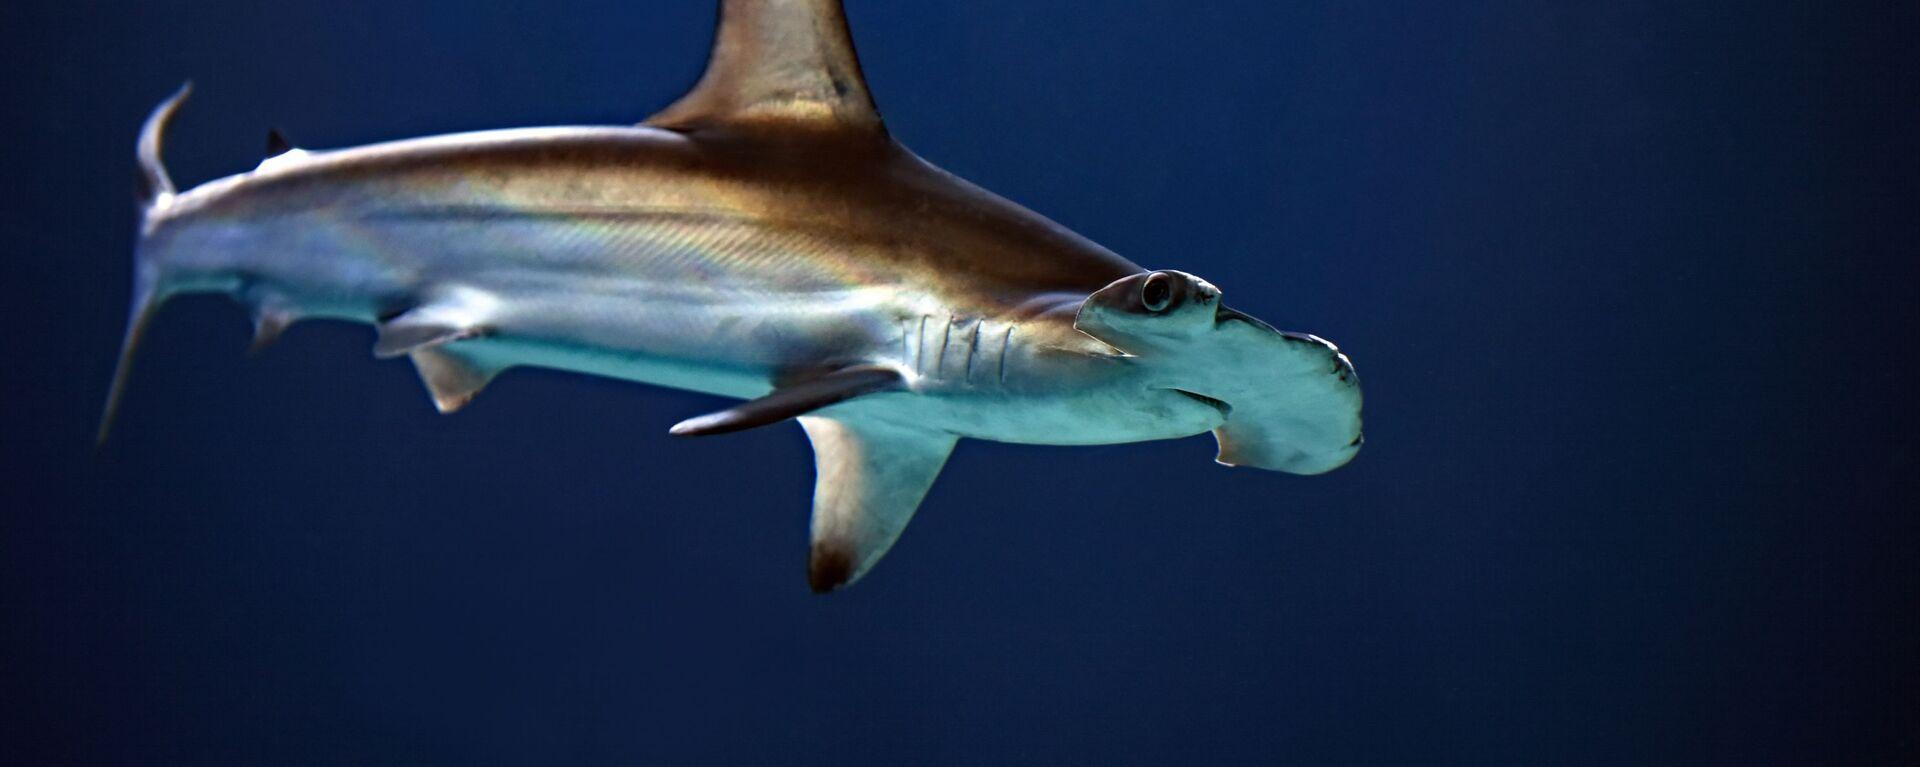 Un tiburón martillo  - Sputnik Mundo, 1920, 20.07.2021